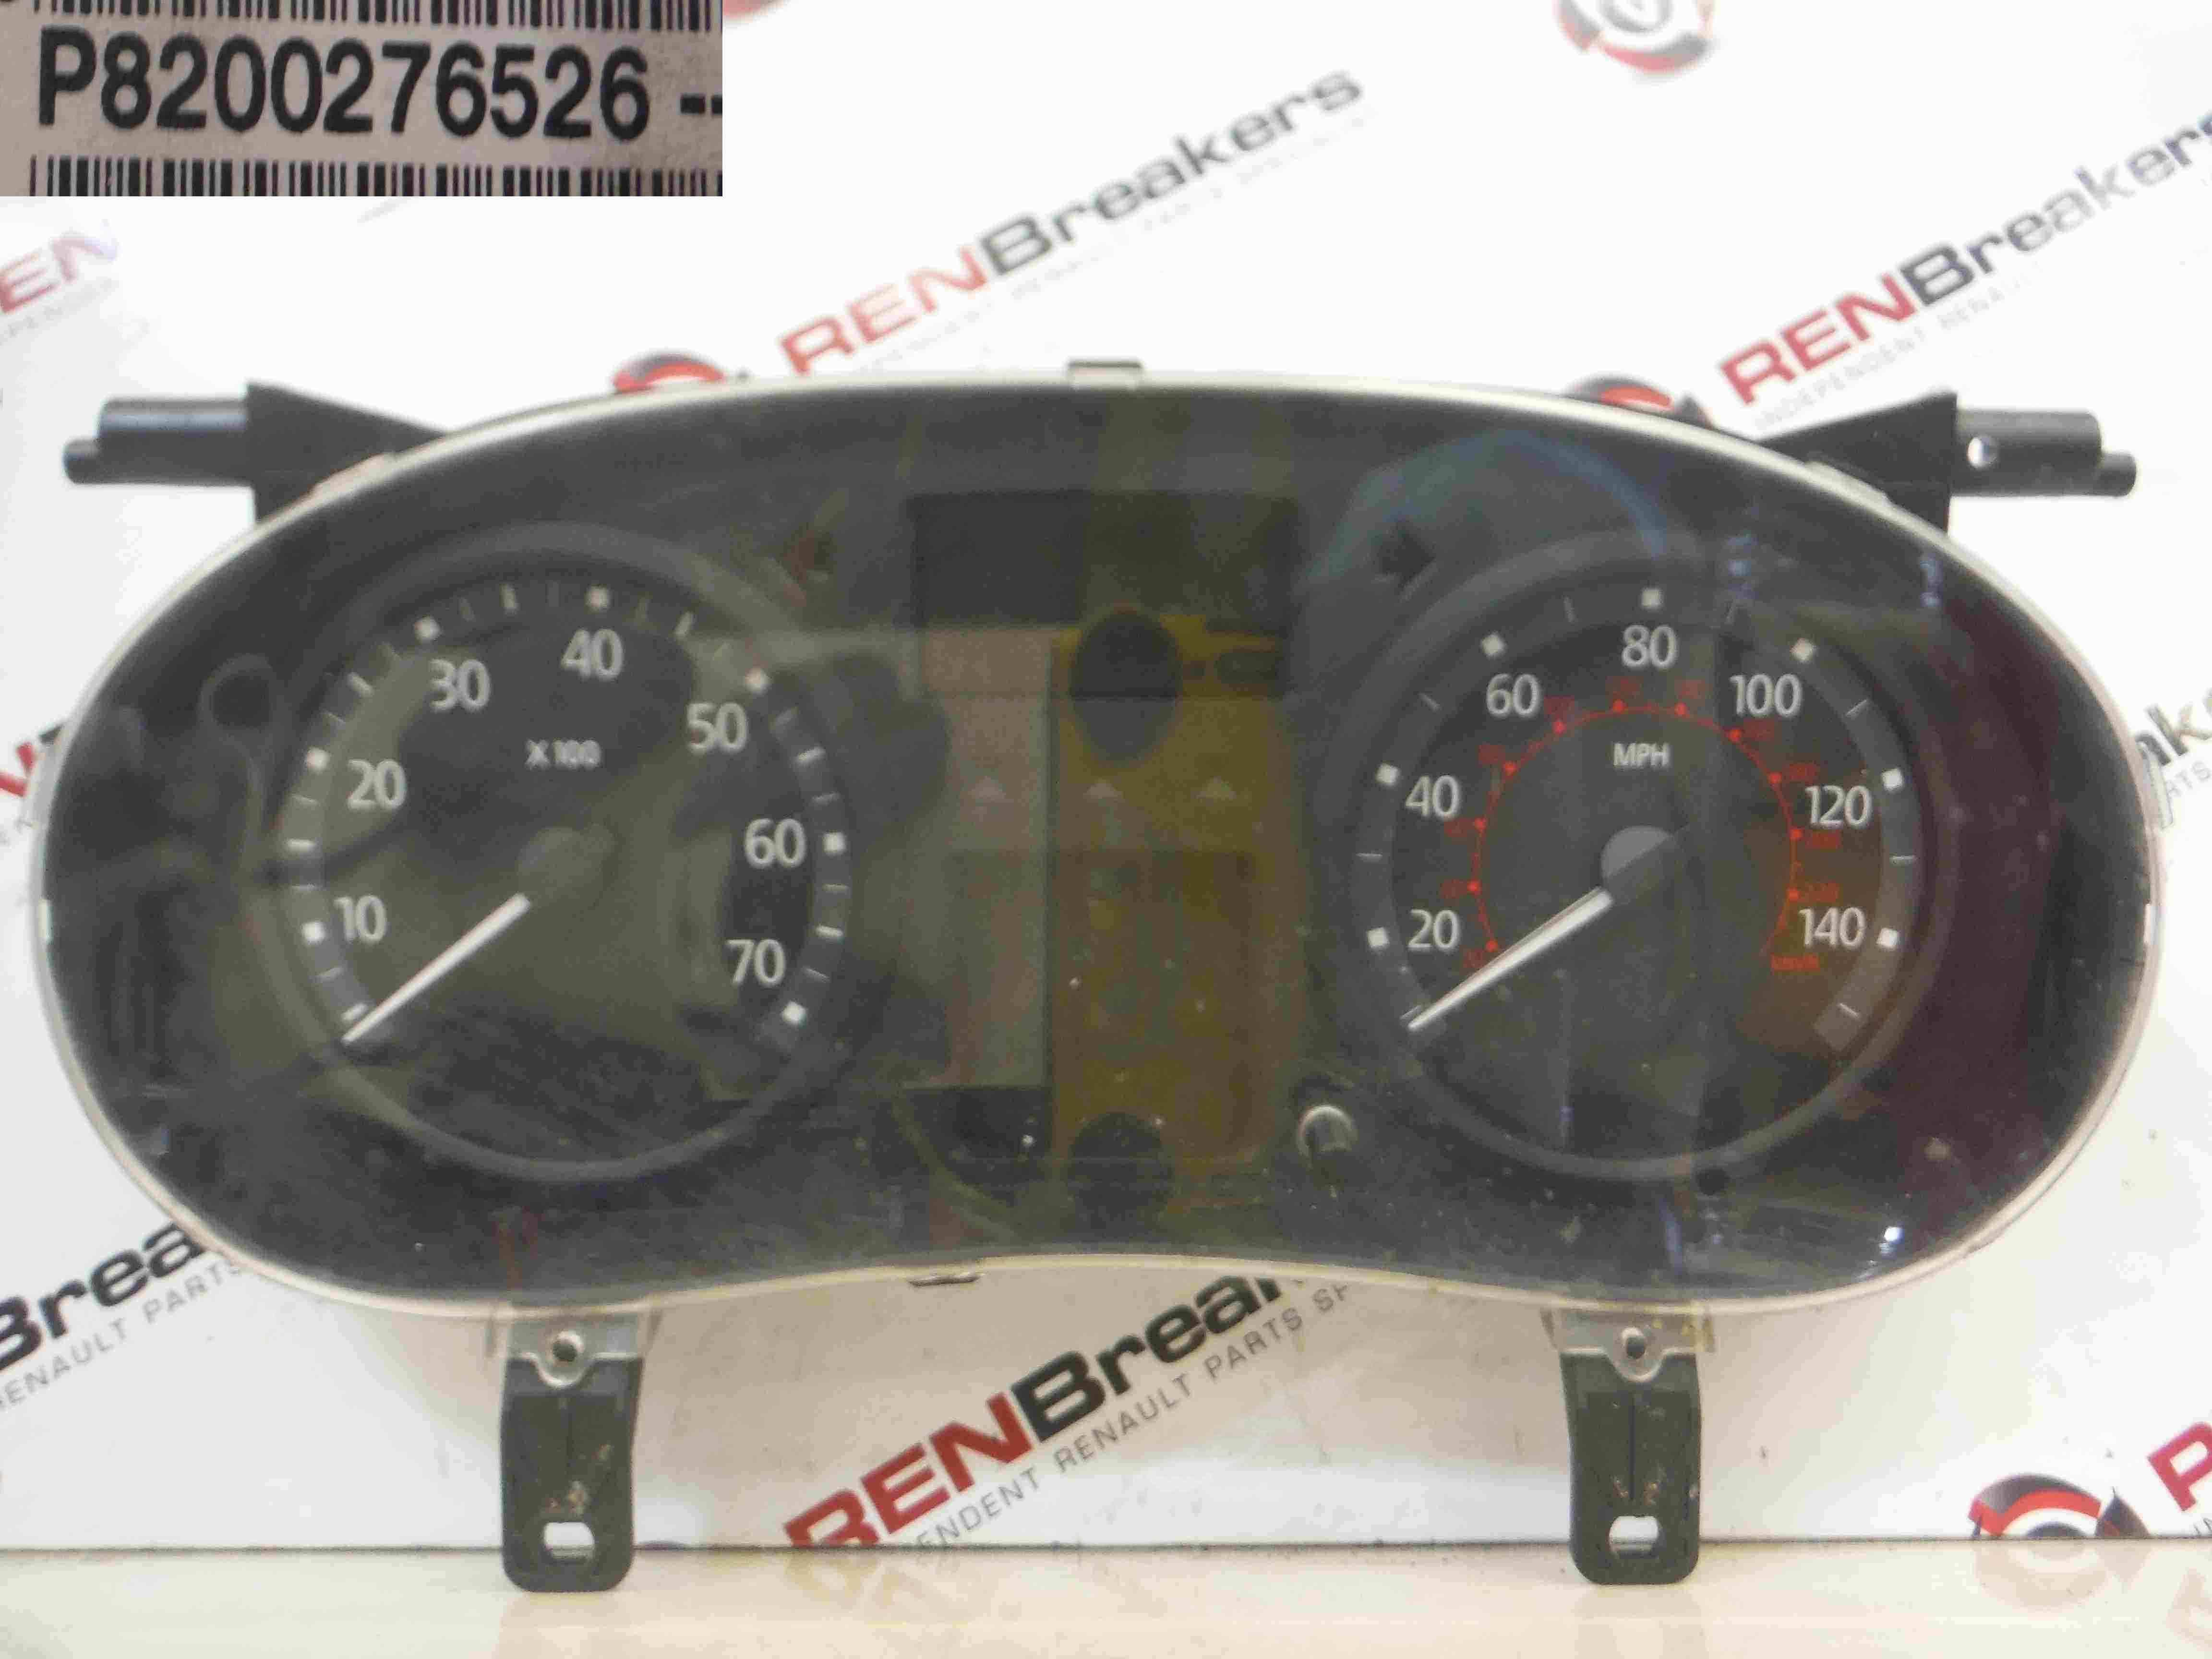 Renault Clio MK2 2001-2006 Instrument Panel Dials Clocks Gauges 126K 8200276526